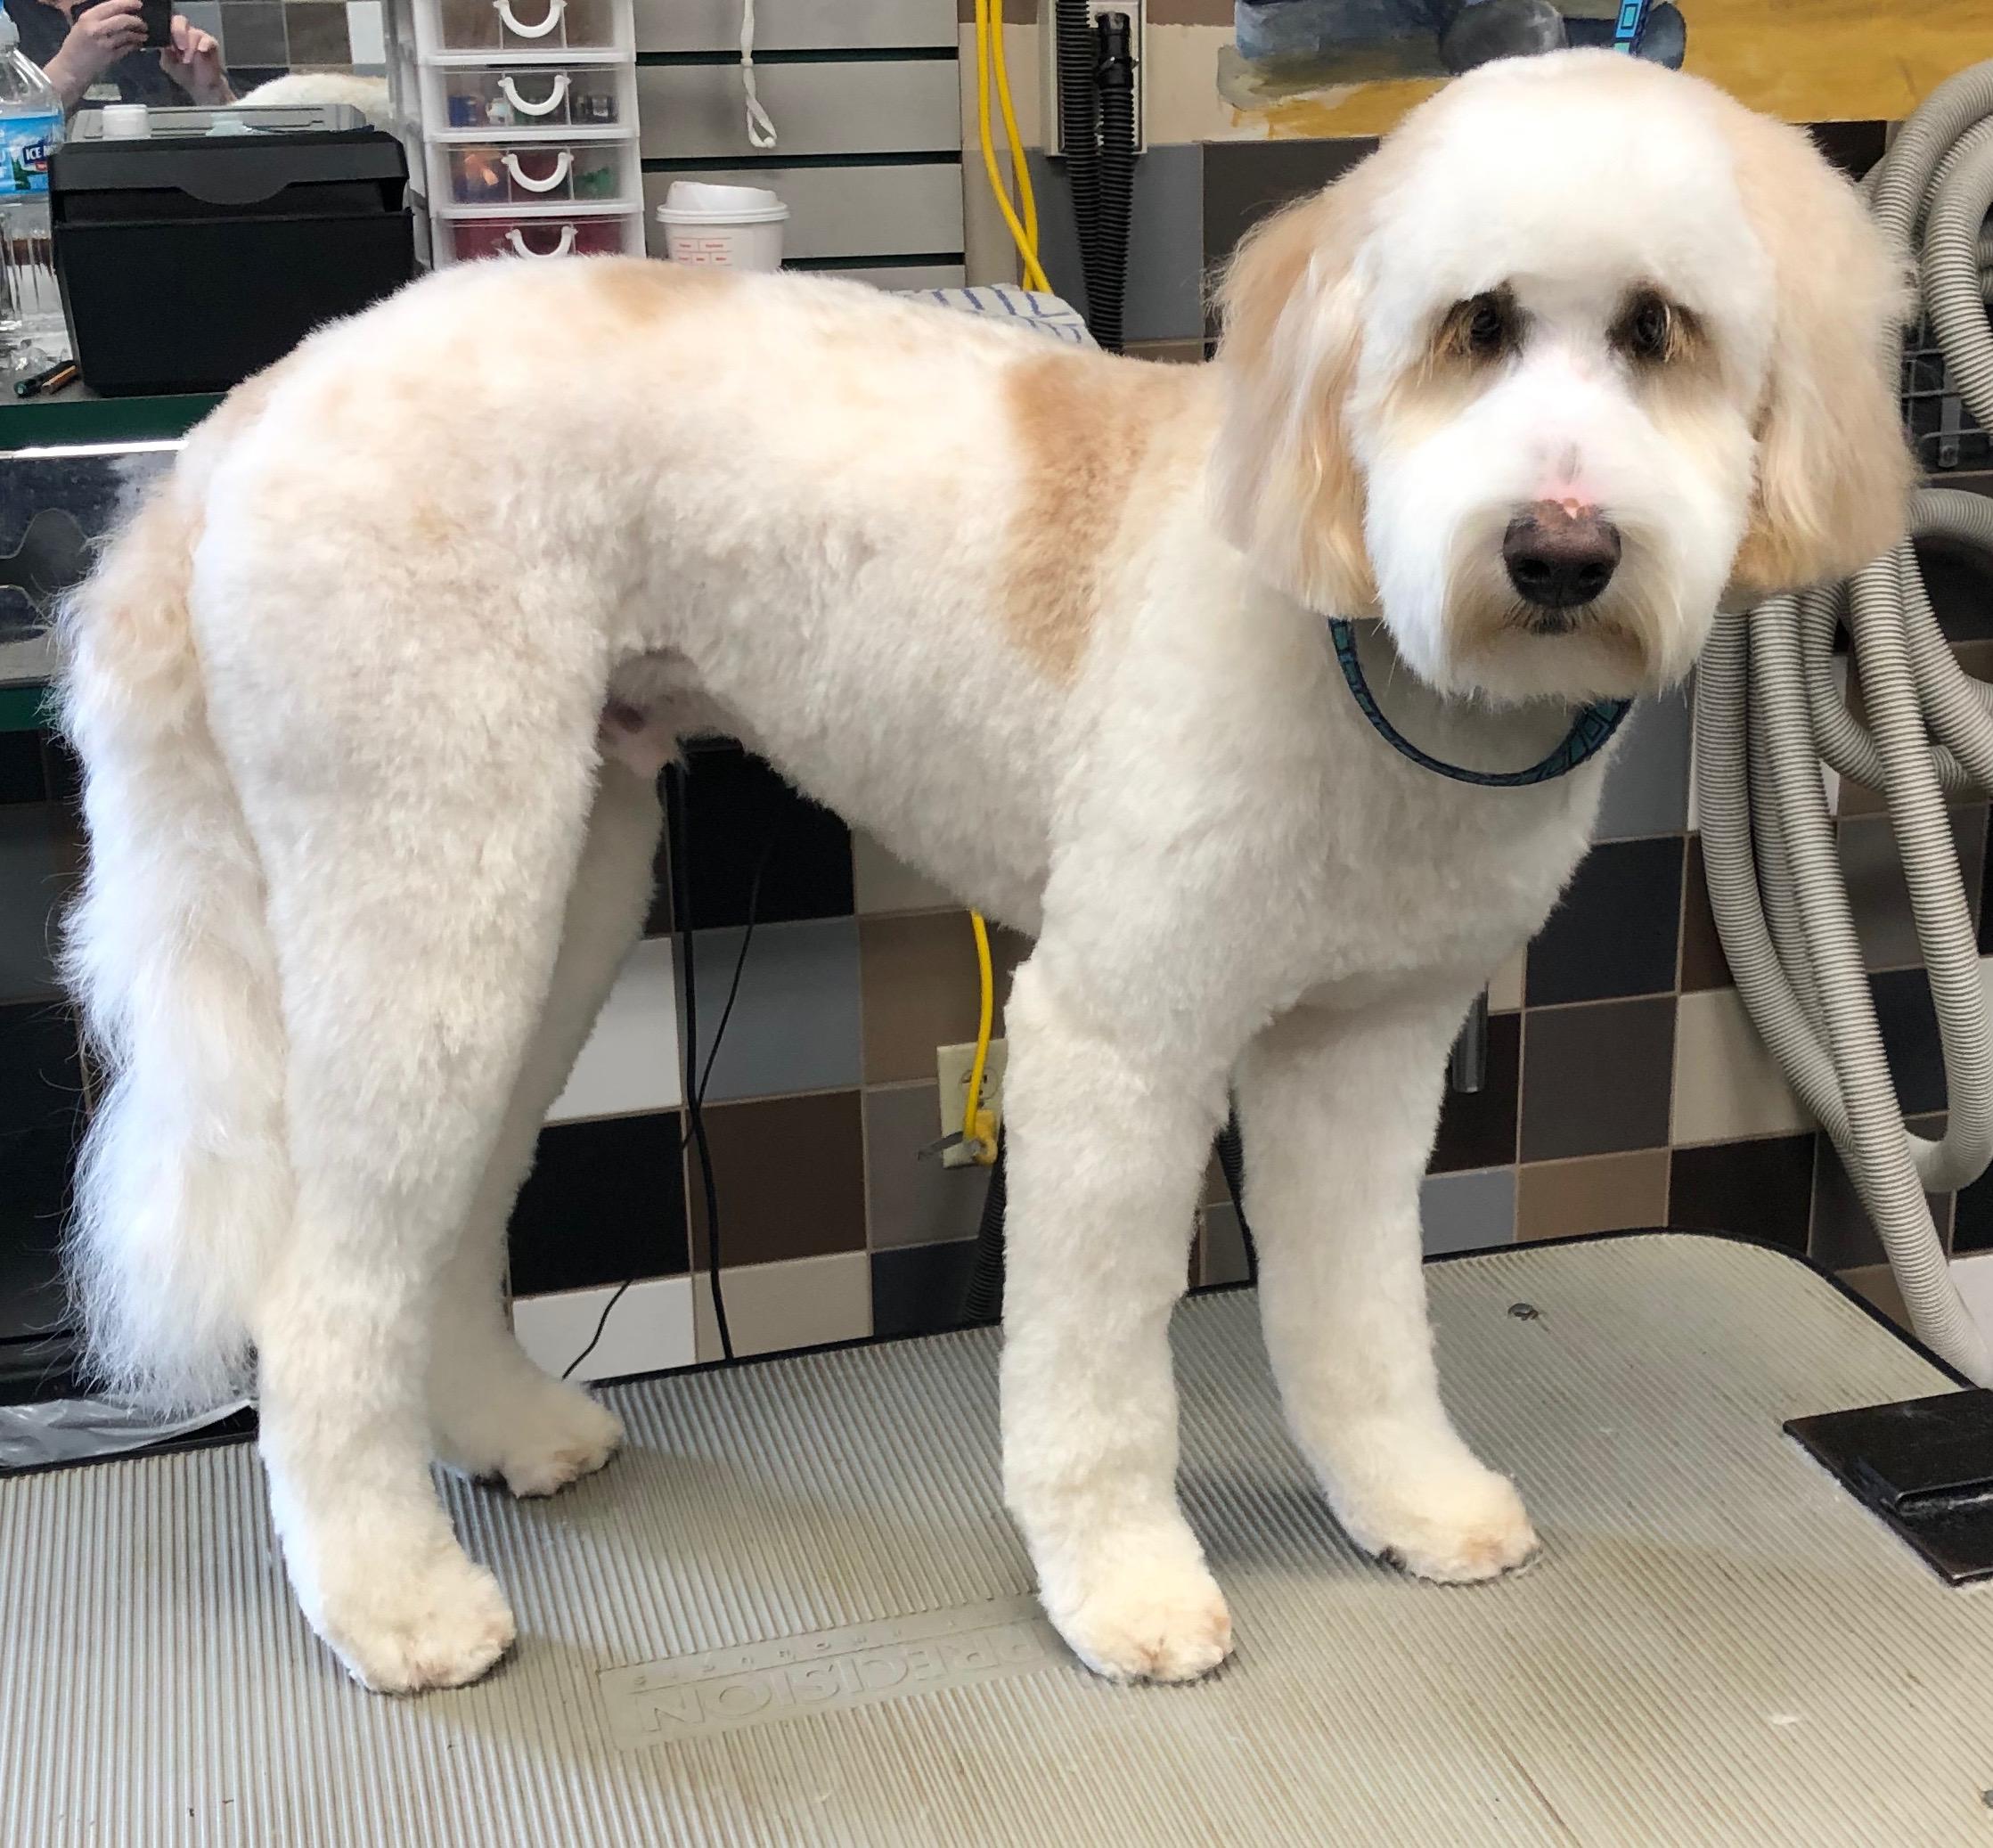 Dog Grooming, Puppy Grooming, Dog Daycare, Dog Boarding, Dog Bath, Dog Nail, Dog Ears, Large Dog Daycare, Doggy Daycare, Small Dog Daycare, Normal Illinois, Bloomington IL